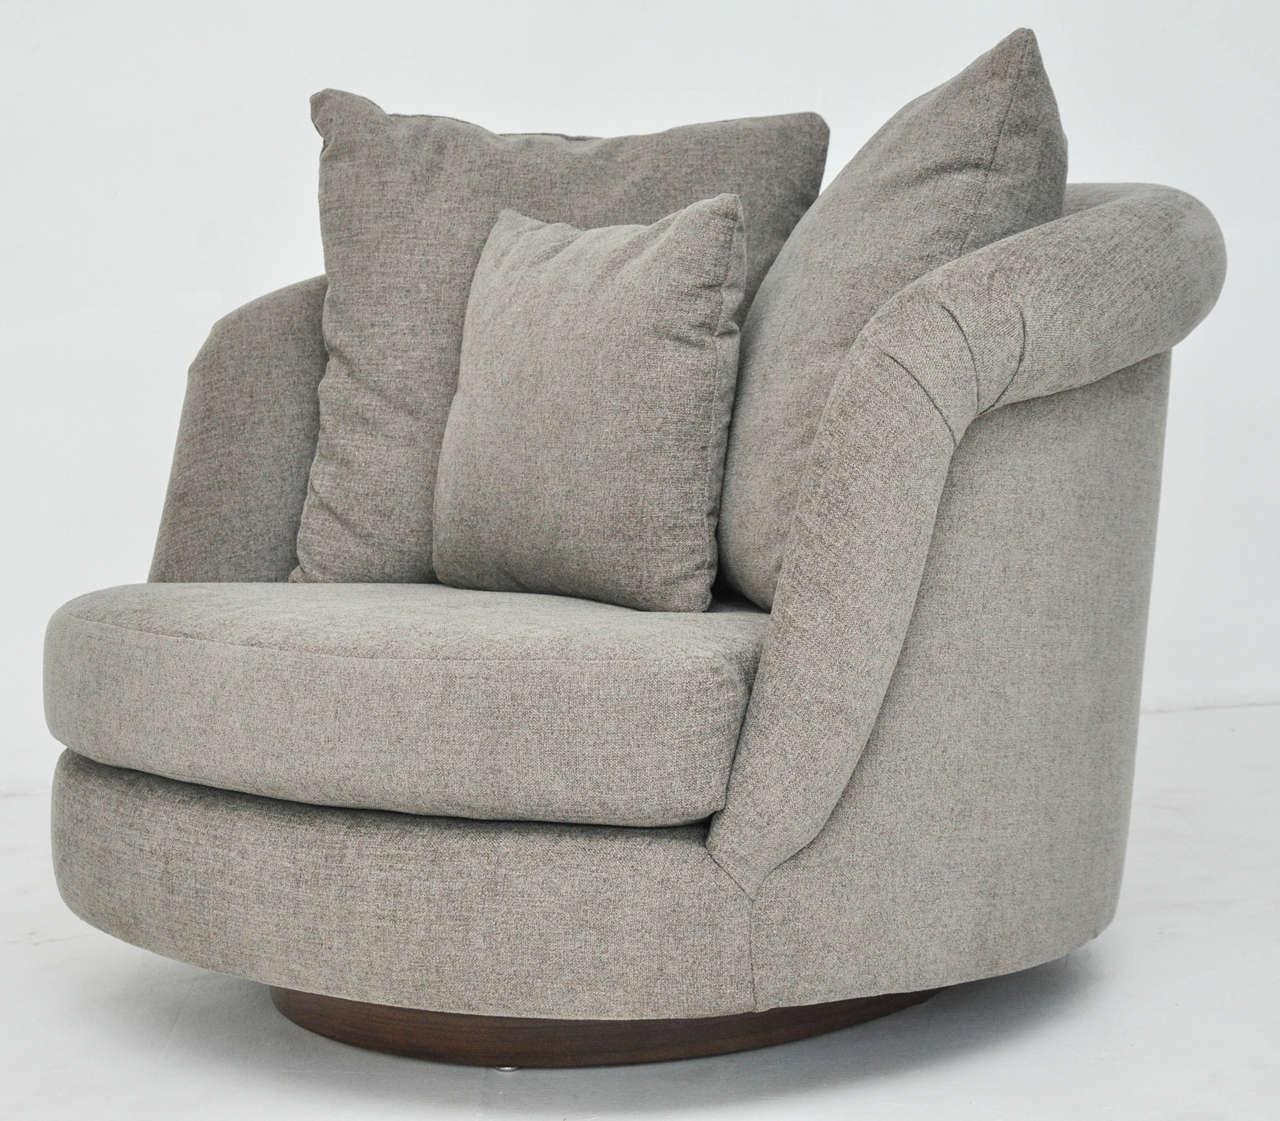 Pair of Large Milo Baughman Swivel Chairs 2